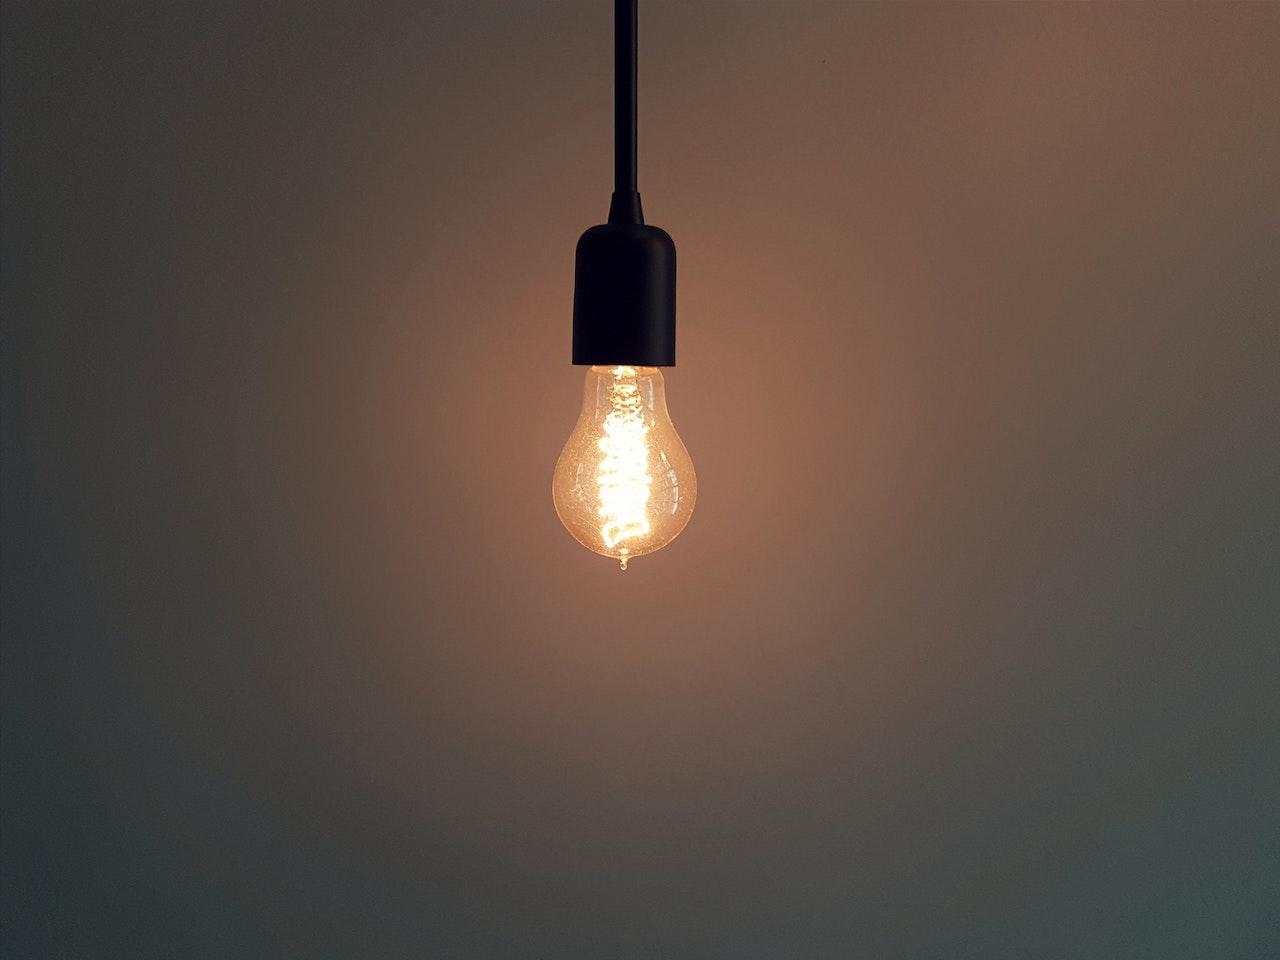 bright-bulb-dark-132340.jpg